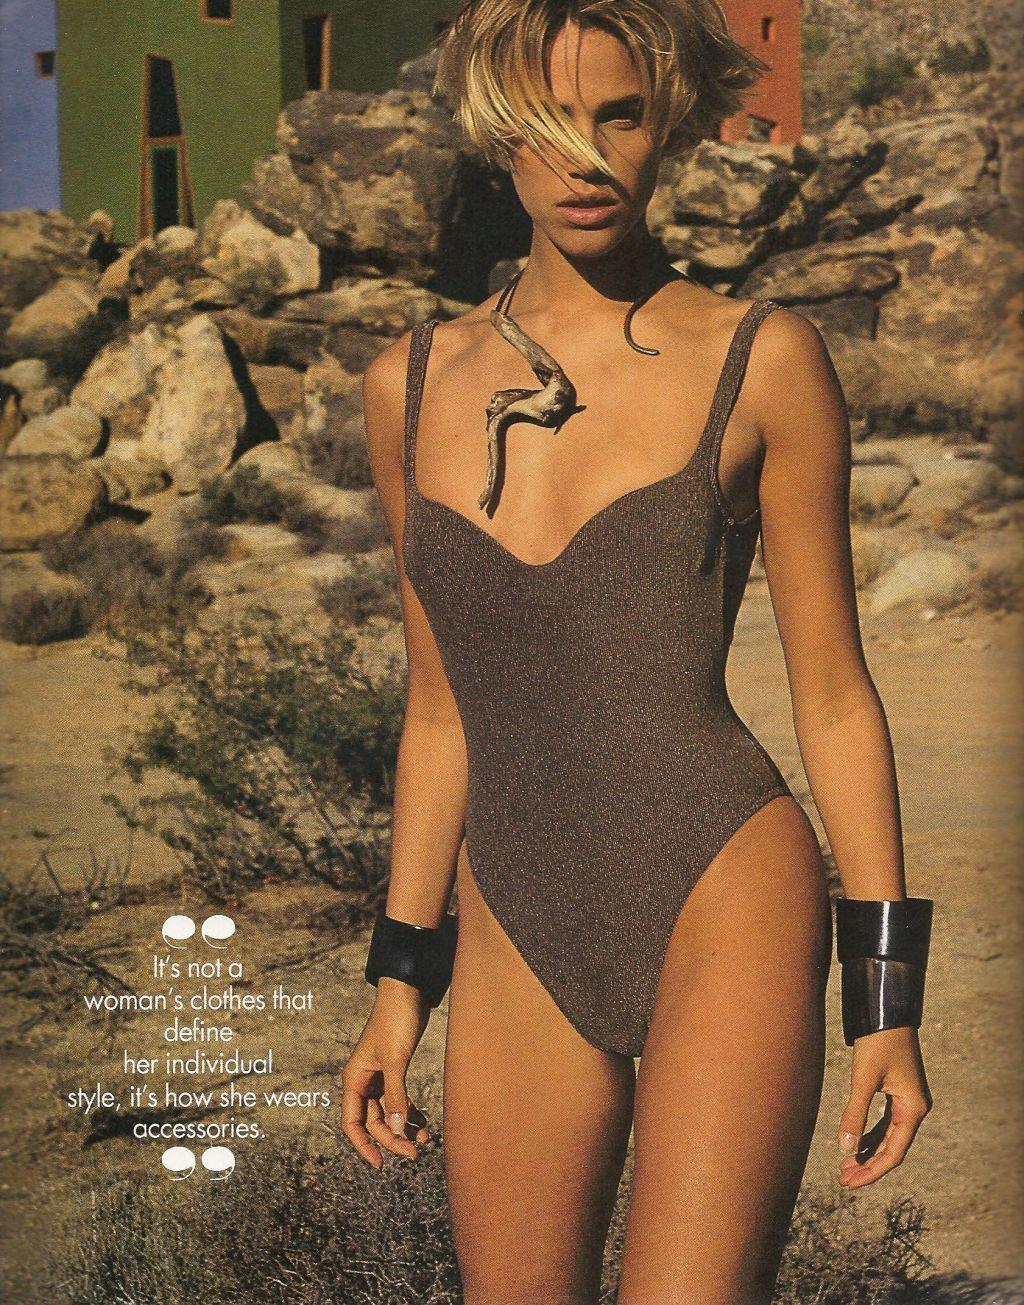 Bikini Emma Sjoberg nudes (52 foto and video), Ass, Bikini, Boobs, lingerie 2006